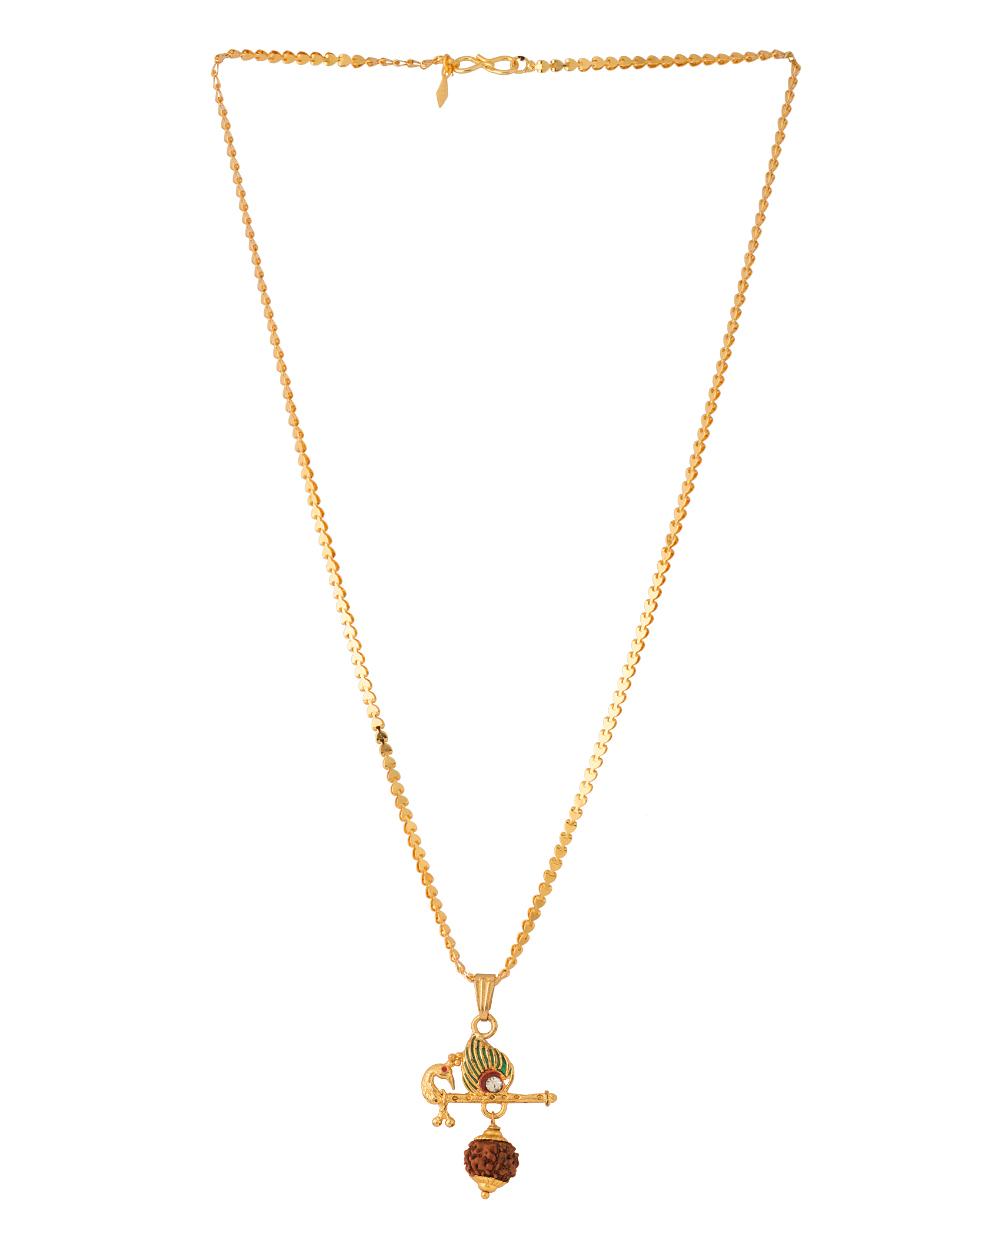 Buy krishna flute peacock feather designer pendant with chain krishna flute peacock feather designer pendant with chain mozeypictures Gallery